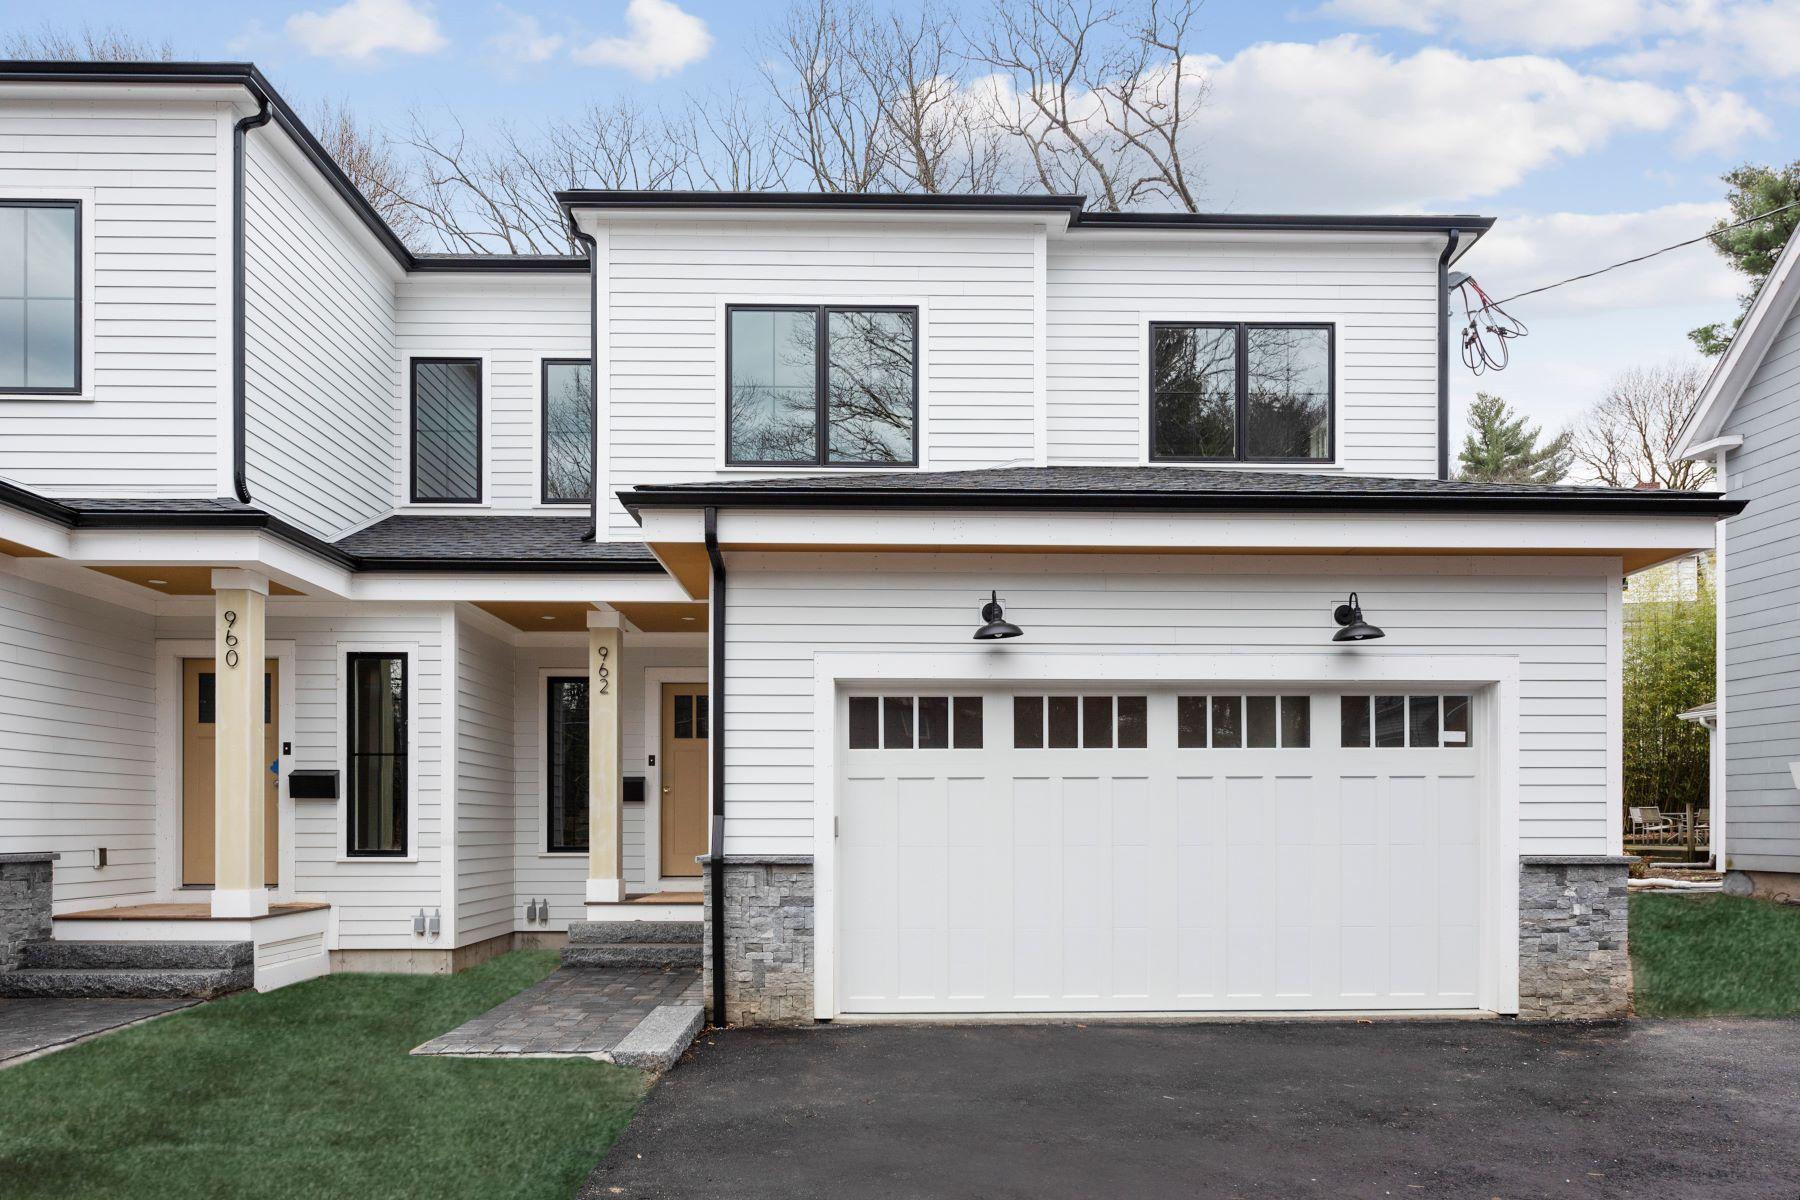 Single Family Homes για την Πώληση στο 962 Walnut Street Newton, Μασαχουσετη 02461 Ηνωμένες Πολιτείες